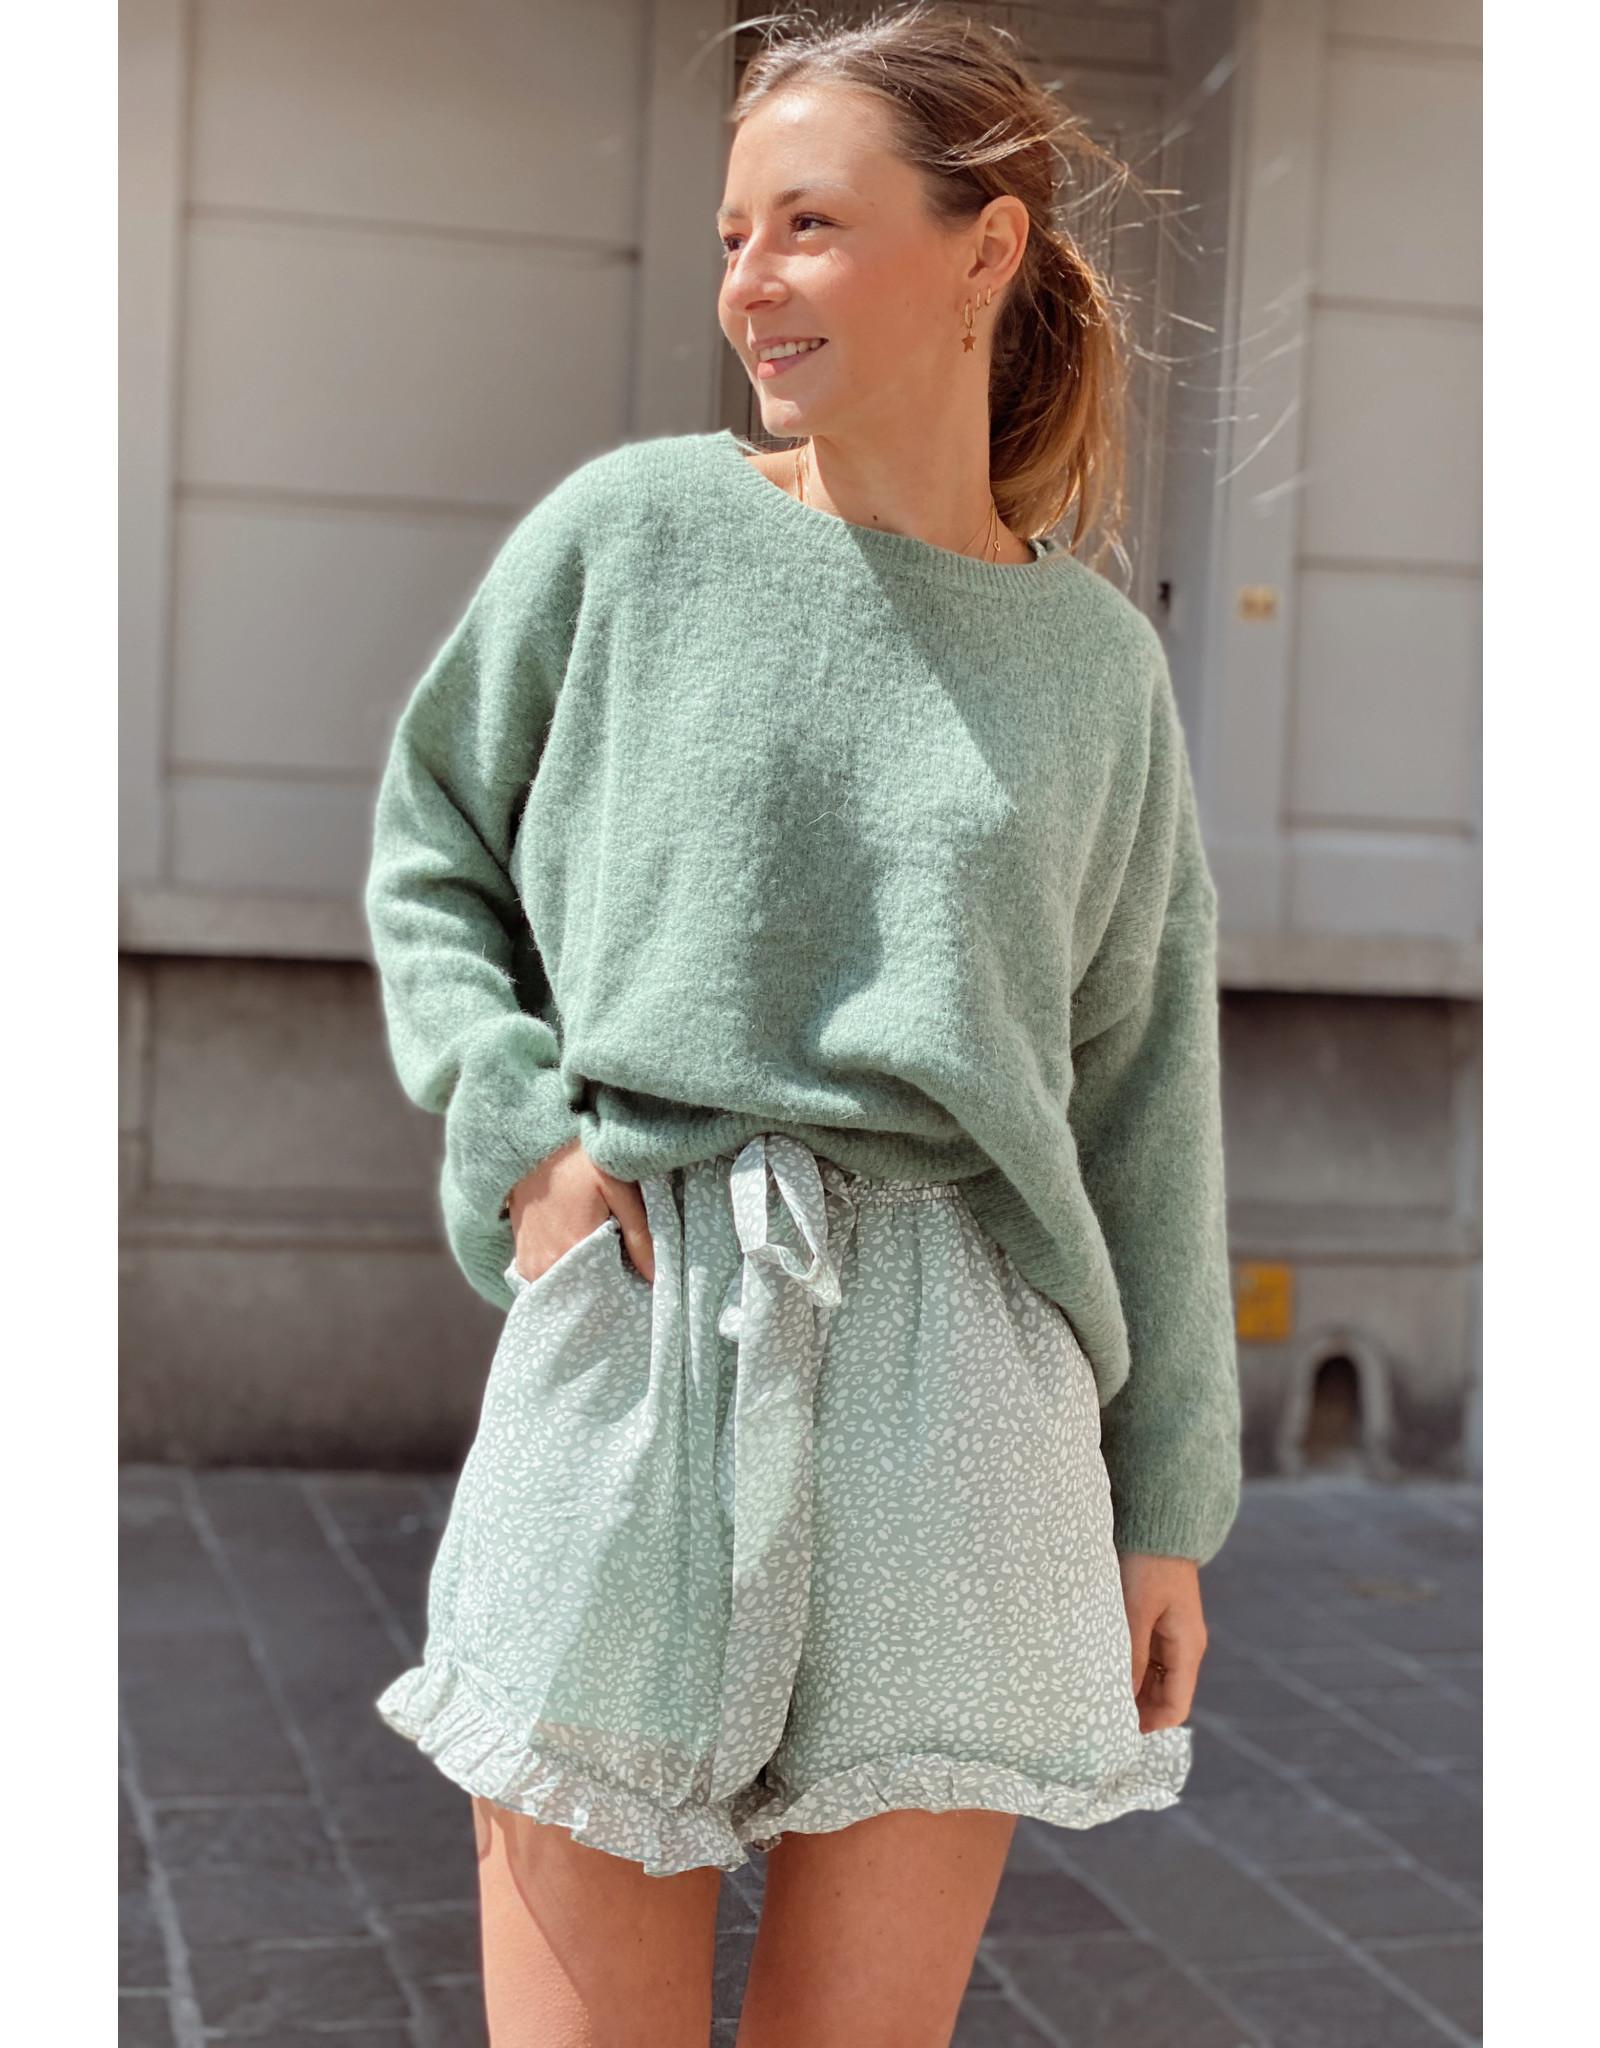 She's Milano x soft melo color green